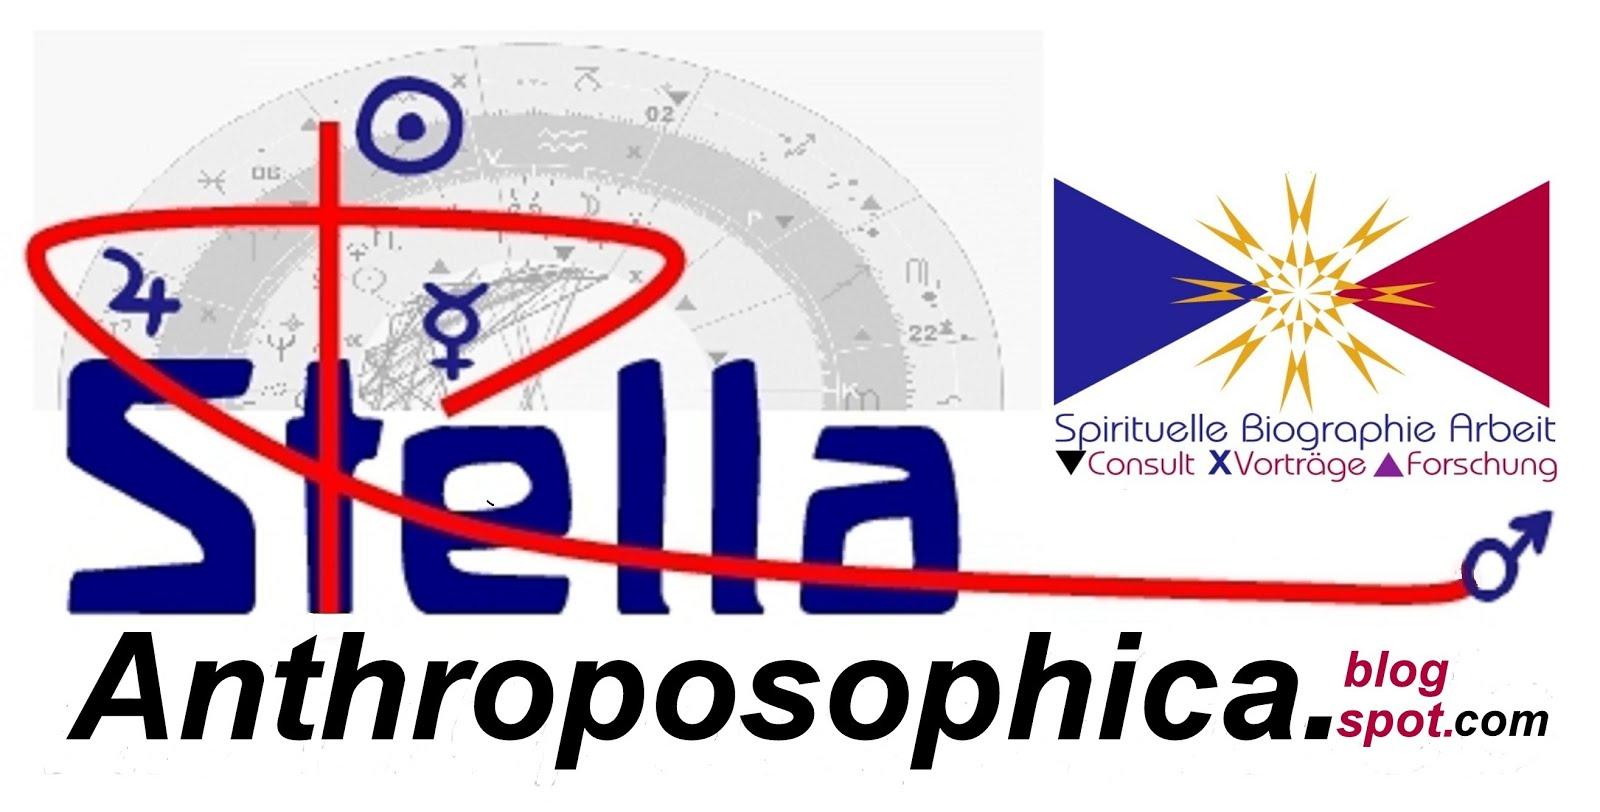 StelllaAnthroposophica